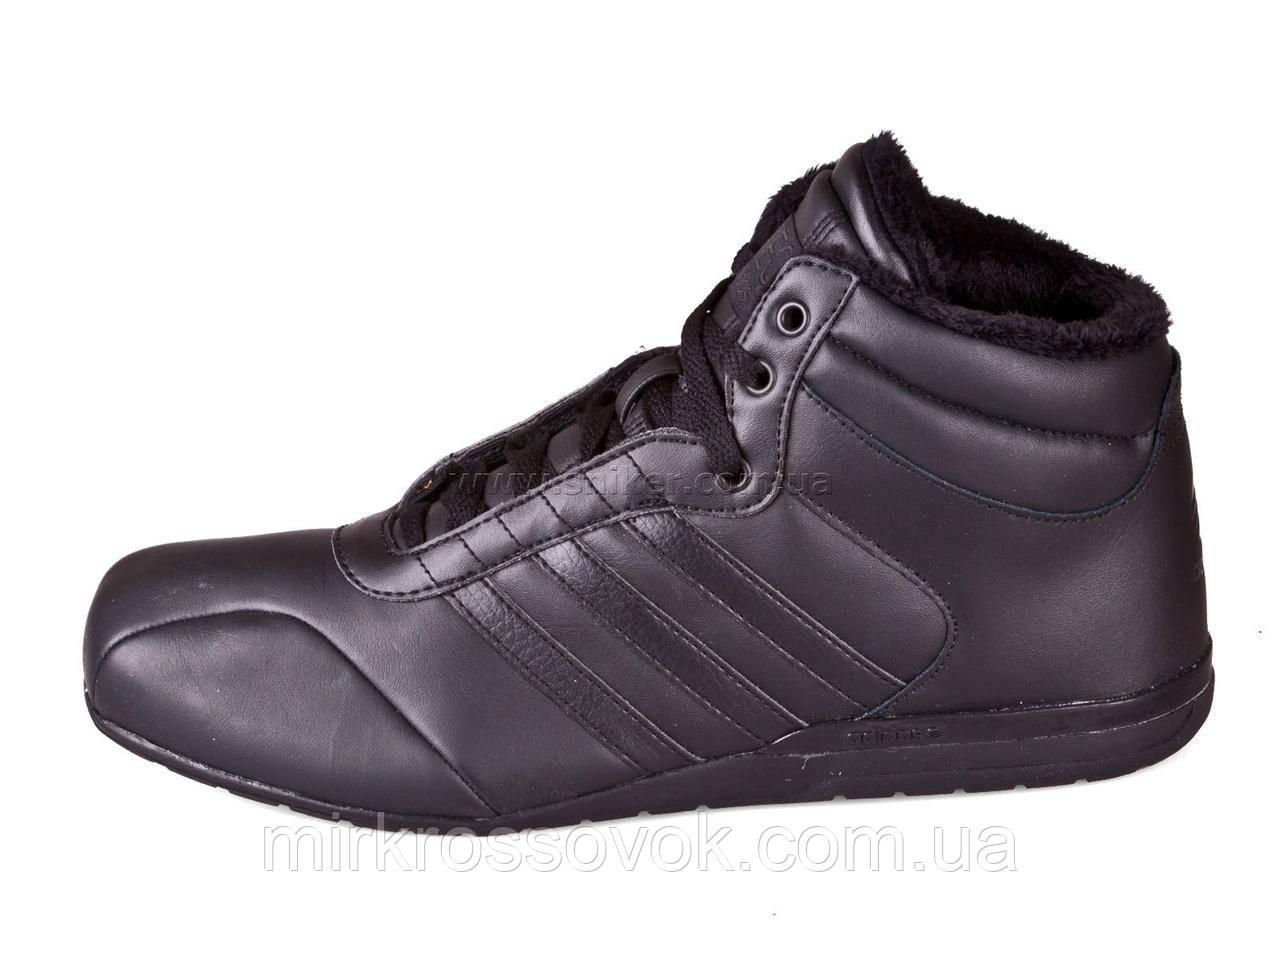 separation shoes b1ec5 d6ebc Мужские Ботинки Adidas NEO RUNNEO STYLE MID G52871 ( оригинал ) -